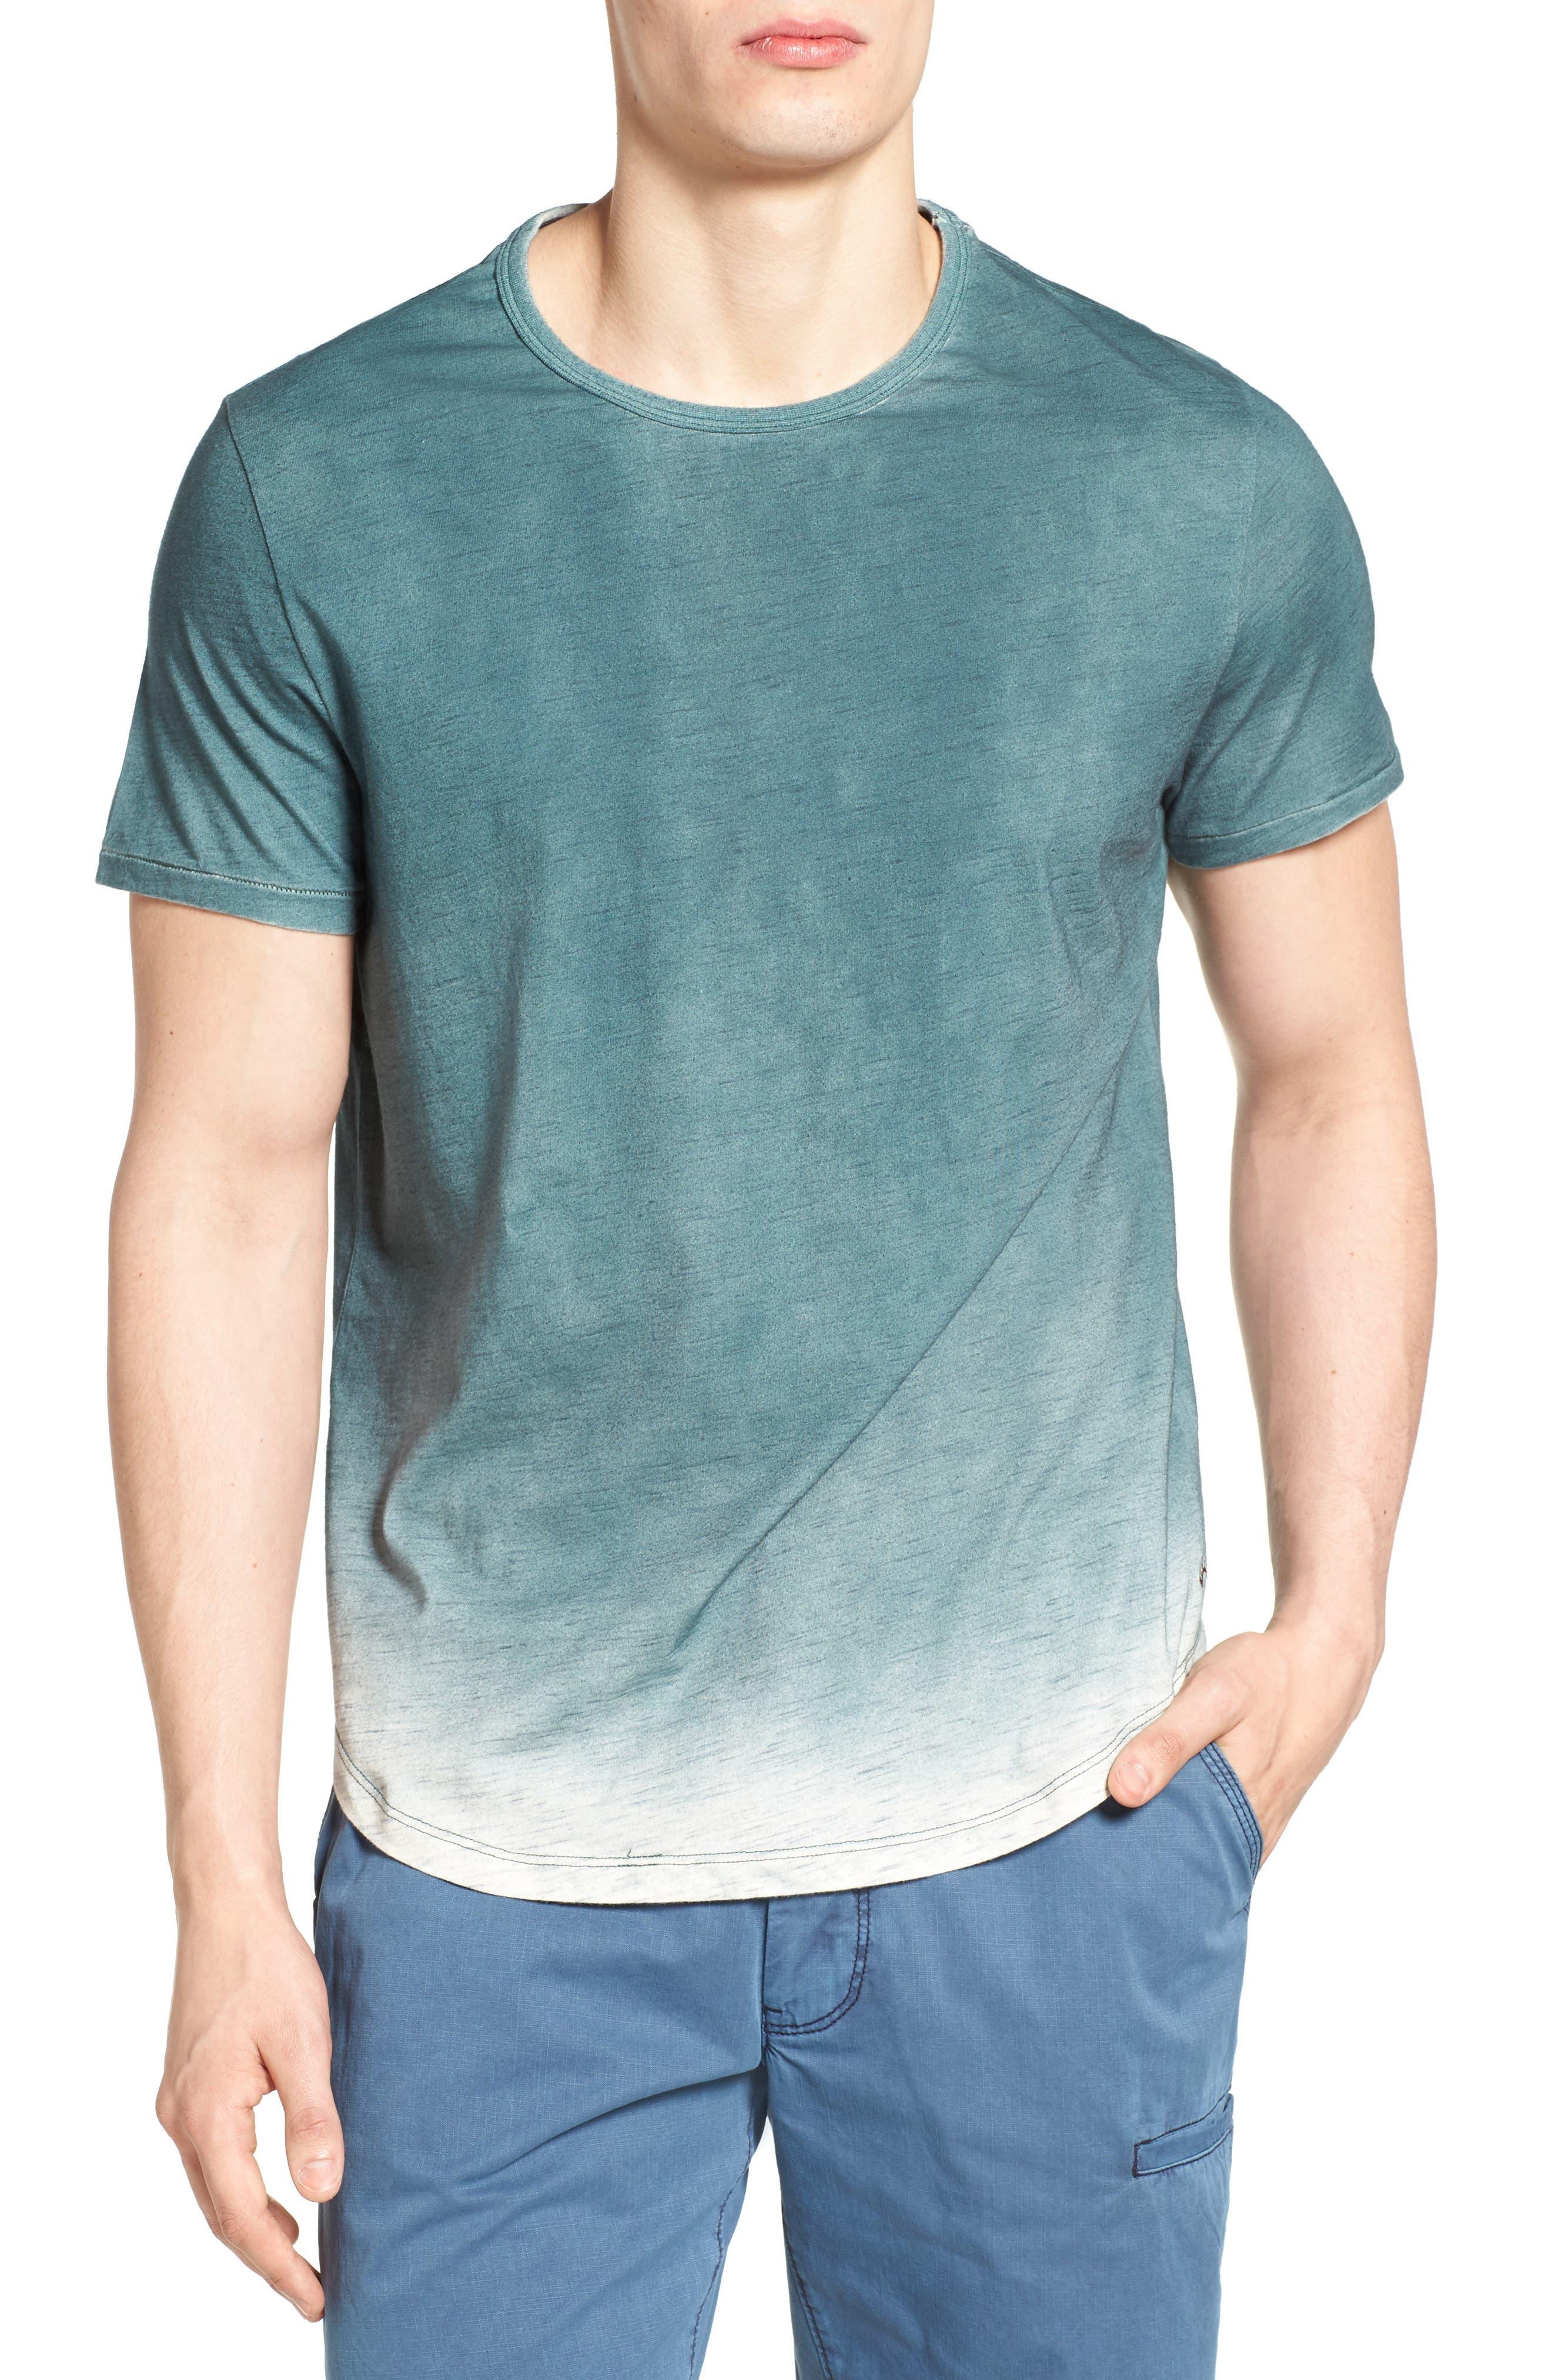 Jeremiah Kendrick Spray Heather Jersey T-Shirt